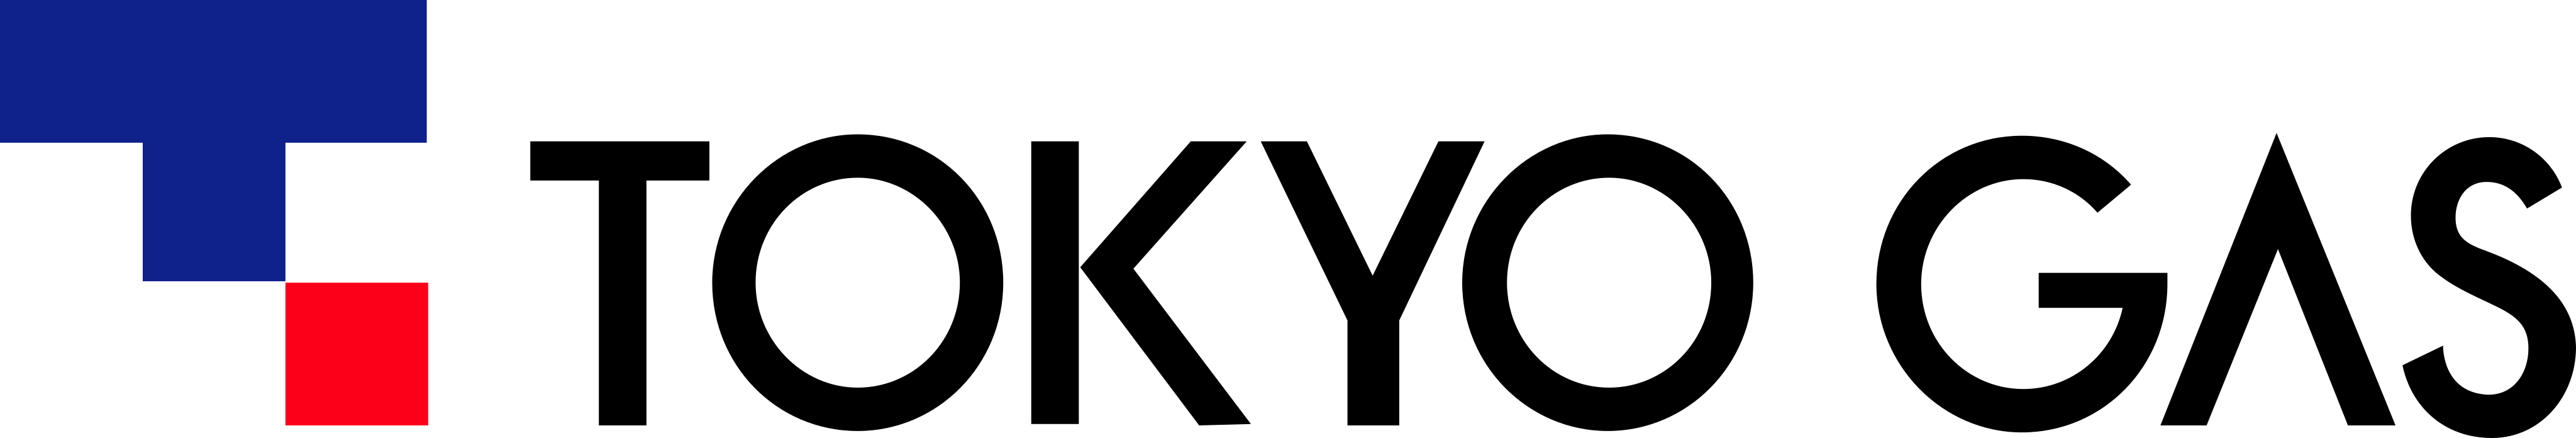 tokyo gas logo - Tokyo Gas Logo